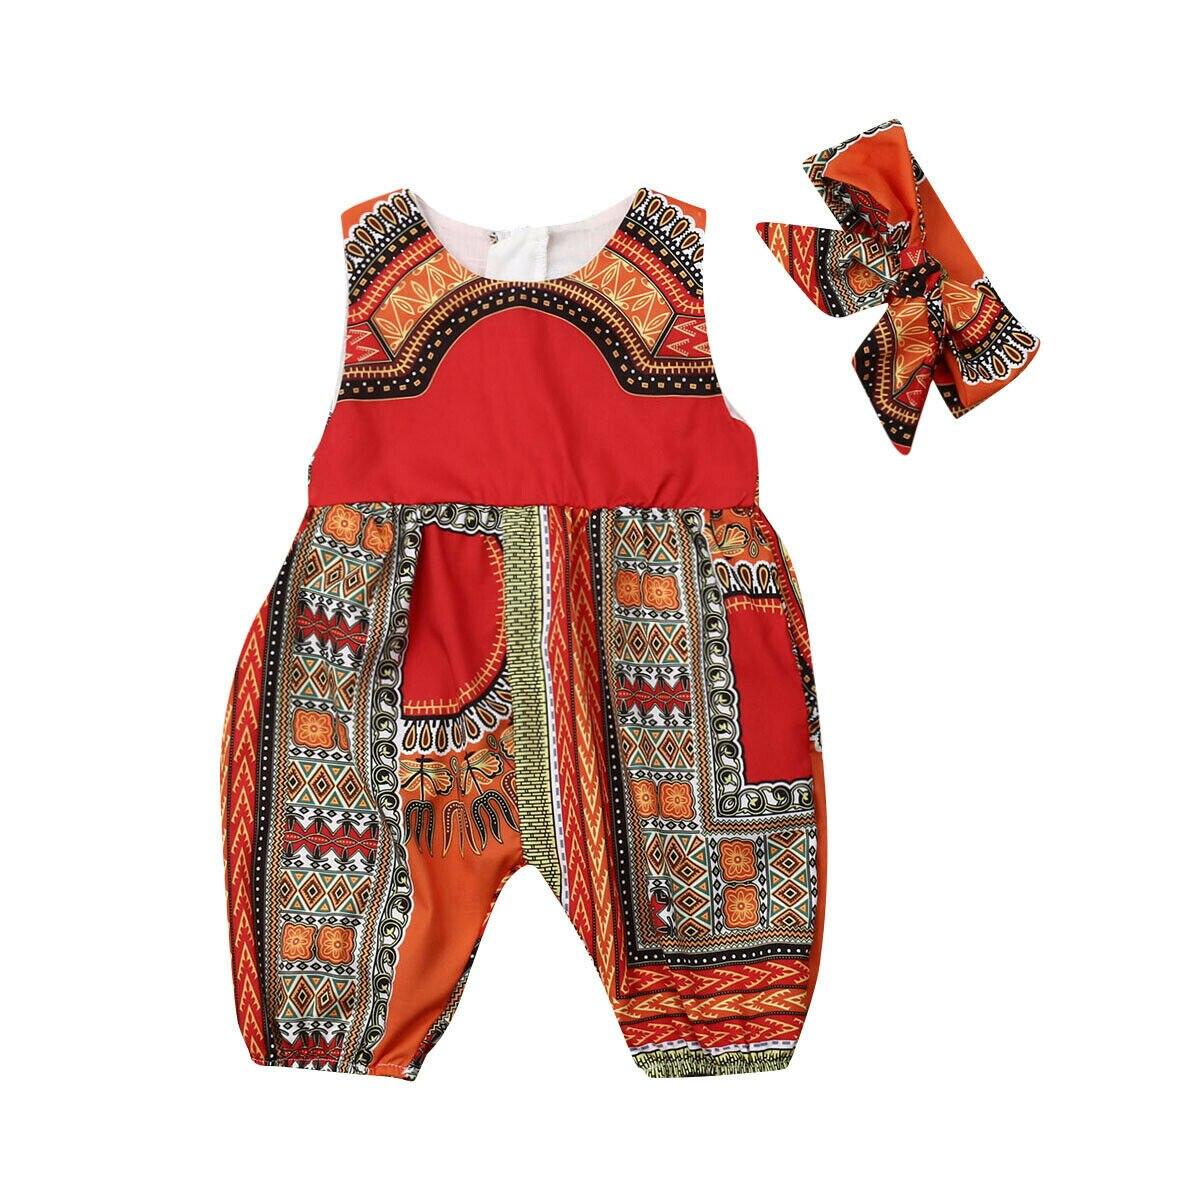 2019 Mode Afrikanischen Stil Infant Neugeborenes Baby Mädchen Kinder Overall Kleinkind Overall Outfit + Bogen Stirnband